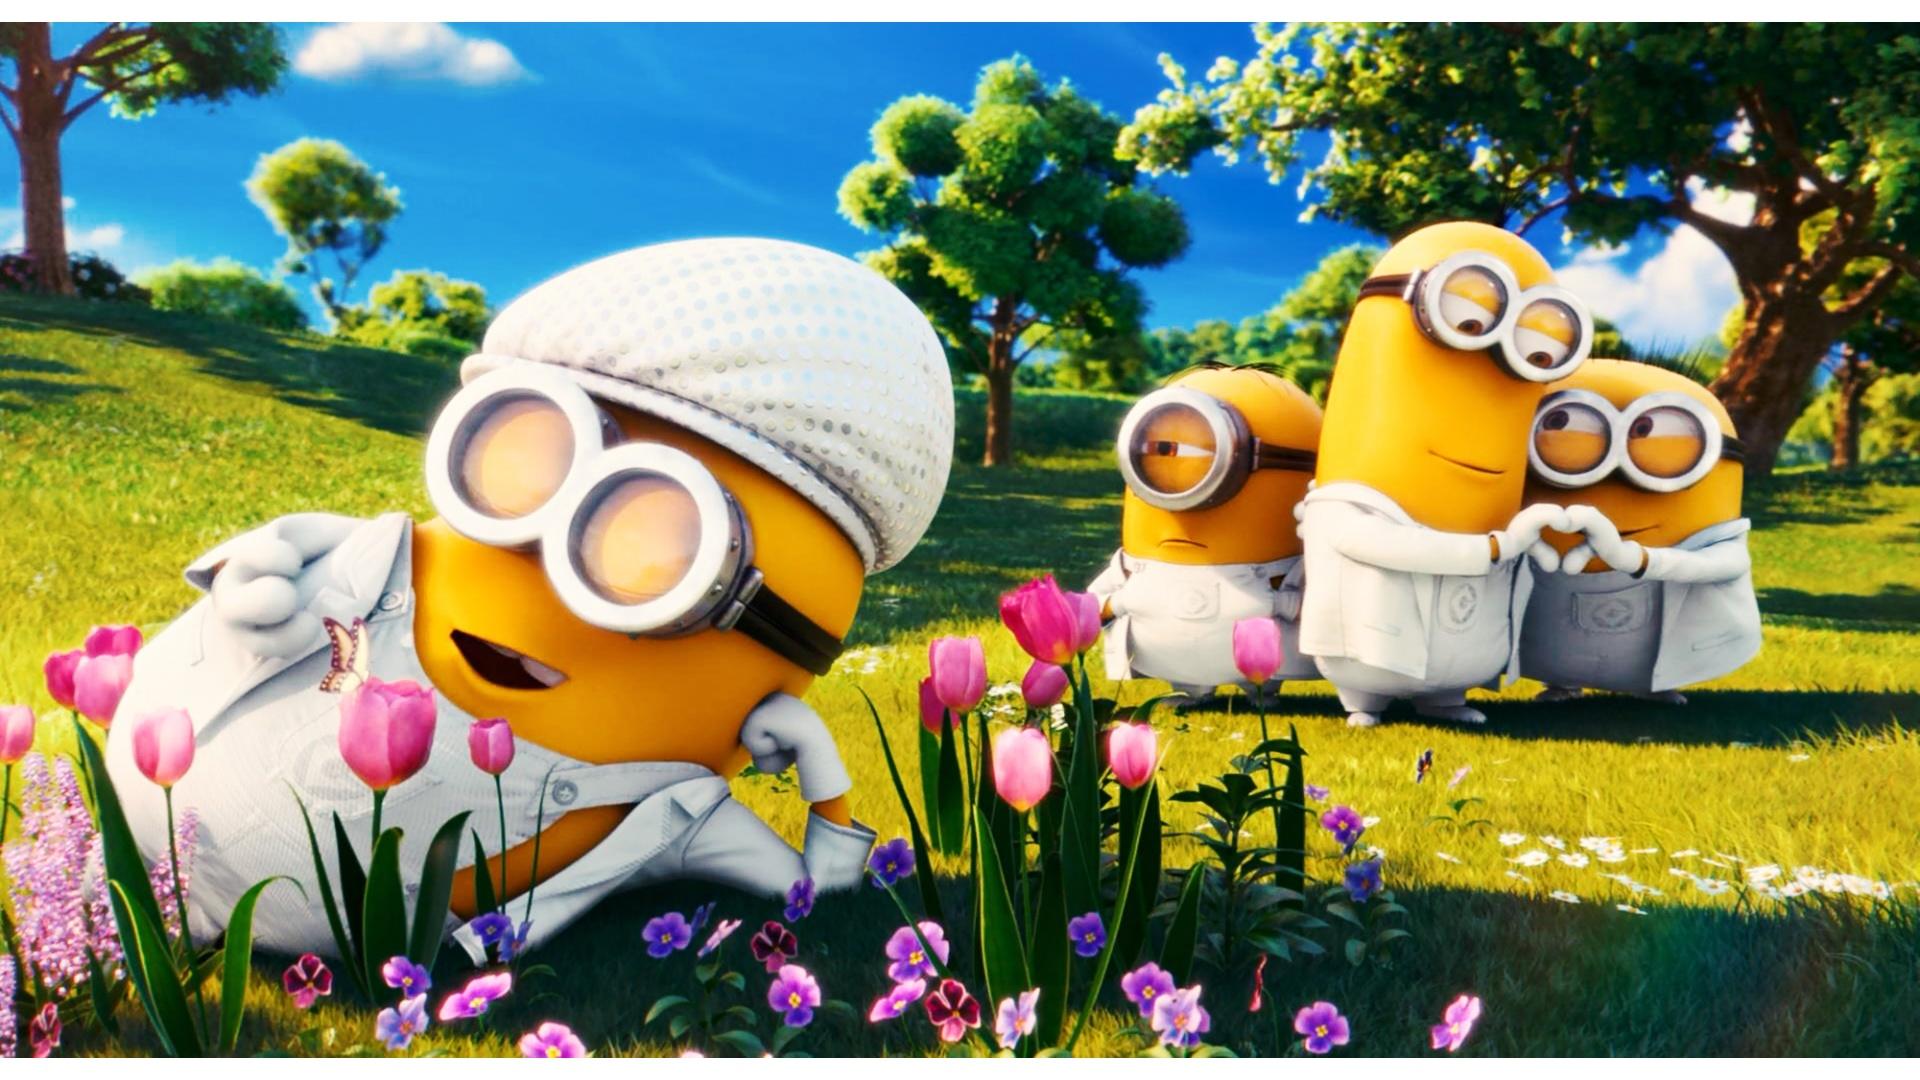 Download Romantic Minions Love Romance HD Wallpaper Search more high 1920x1080